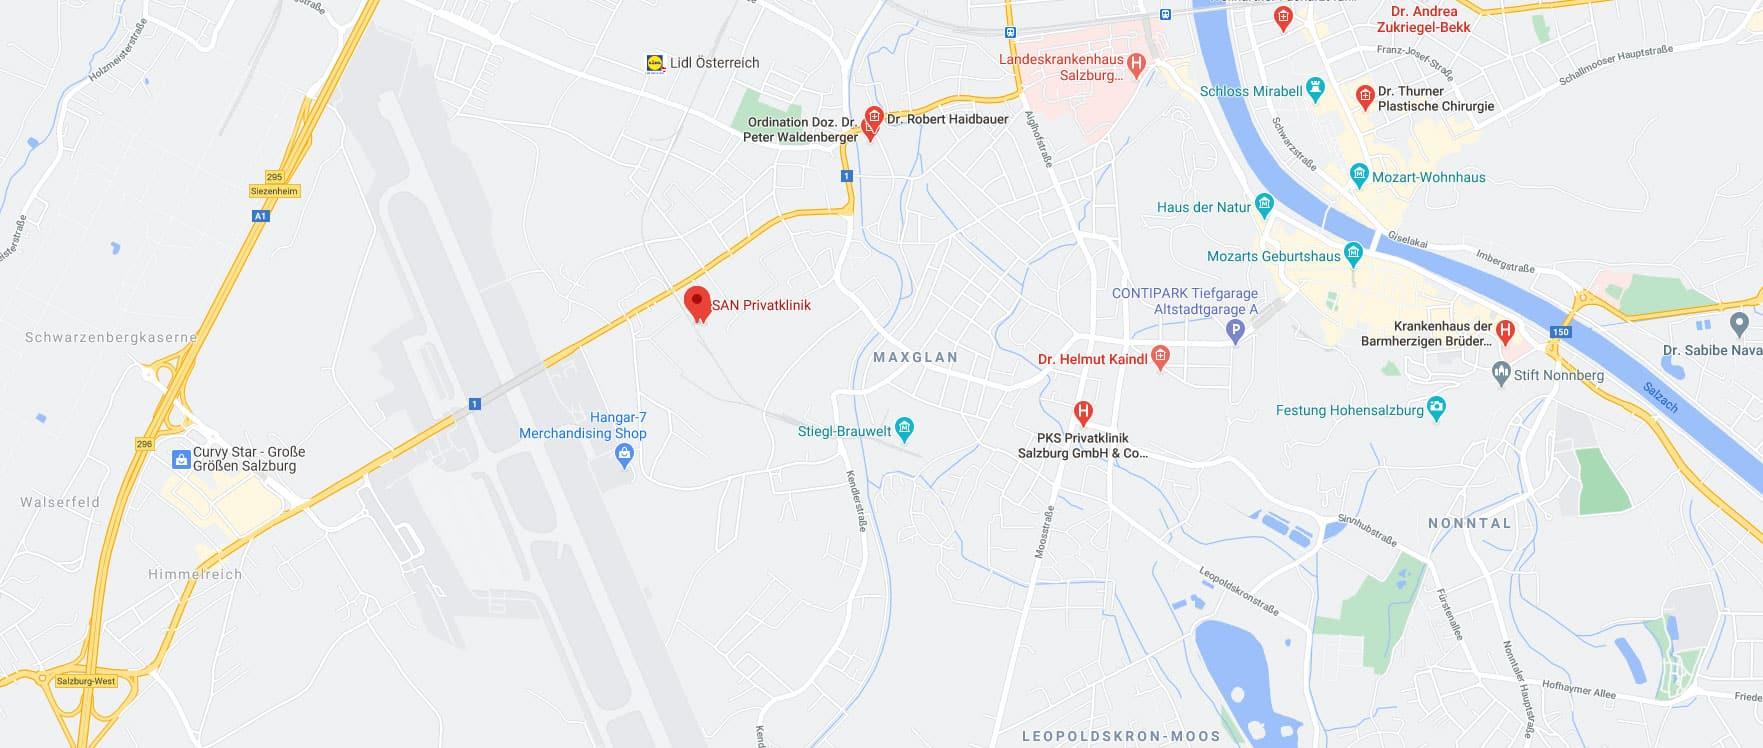 SAN Privatklinik Karte Salzburg